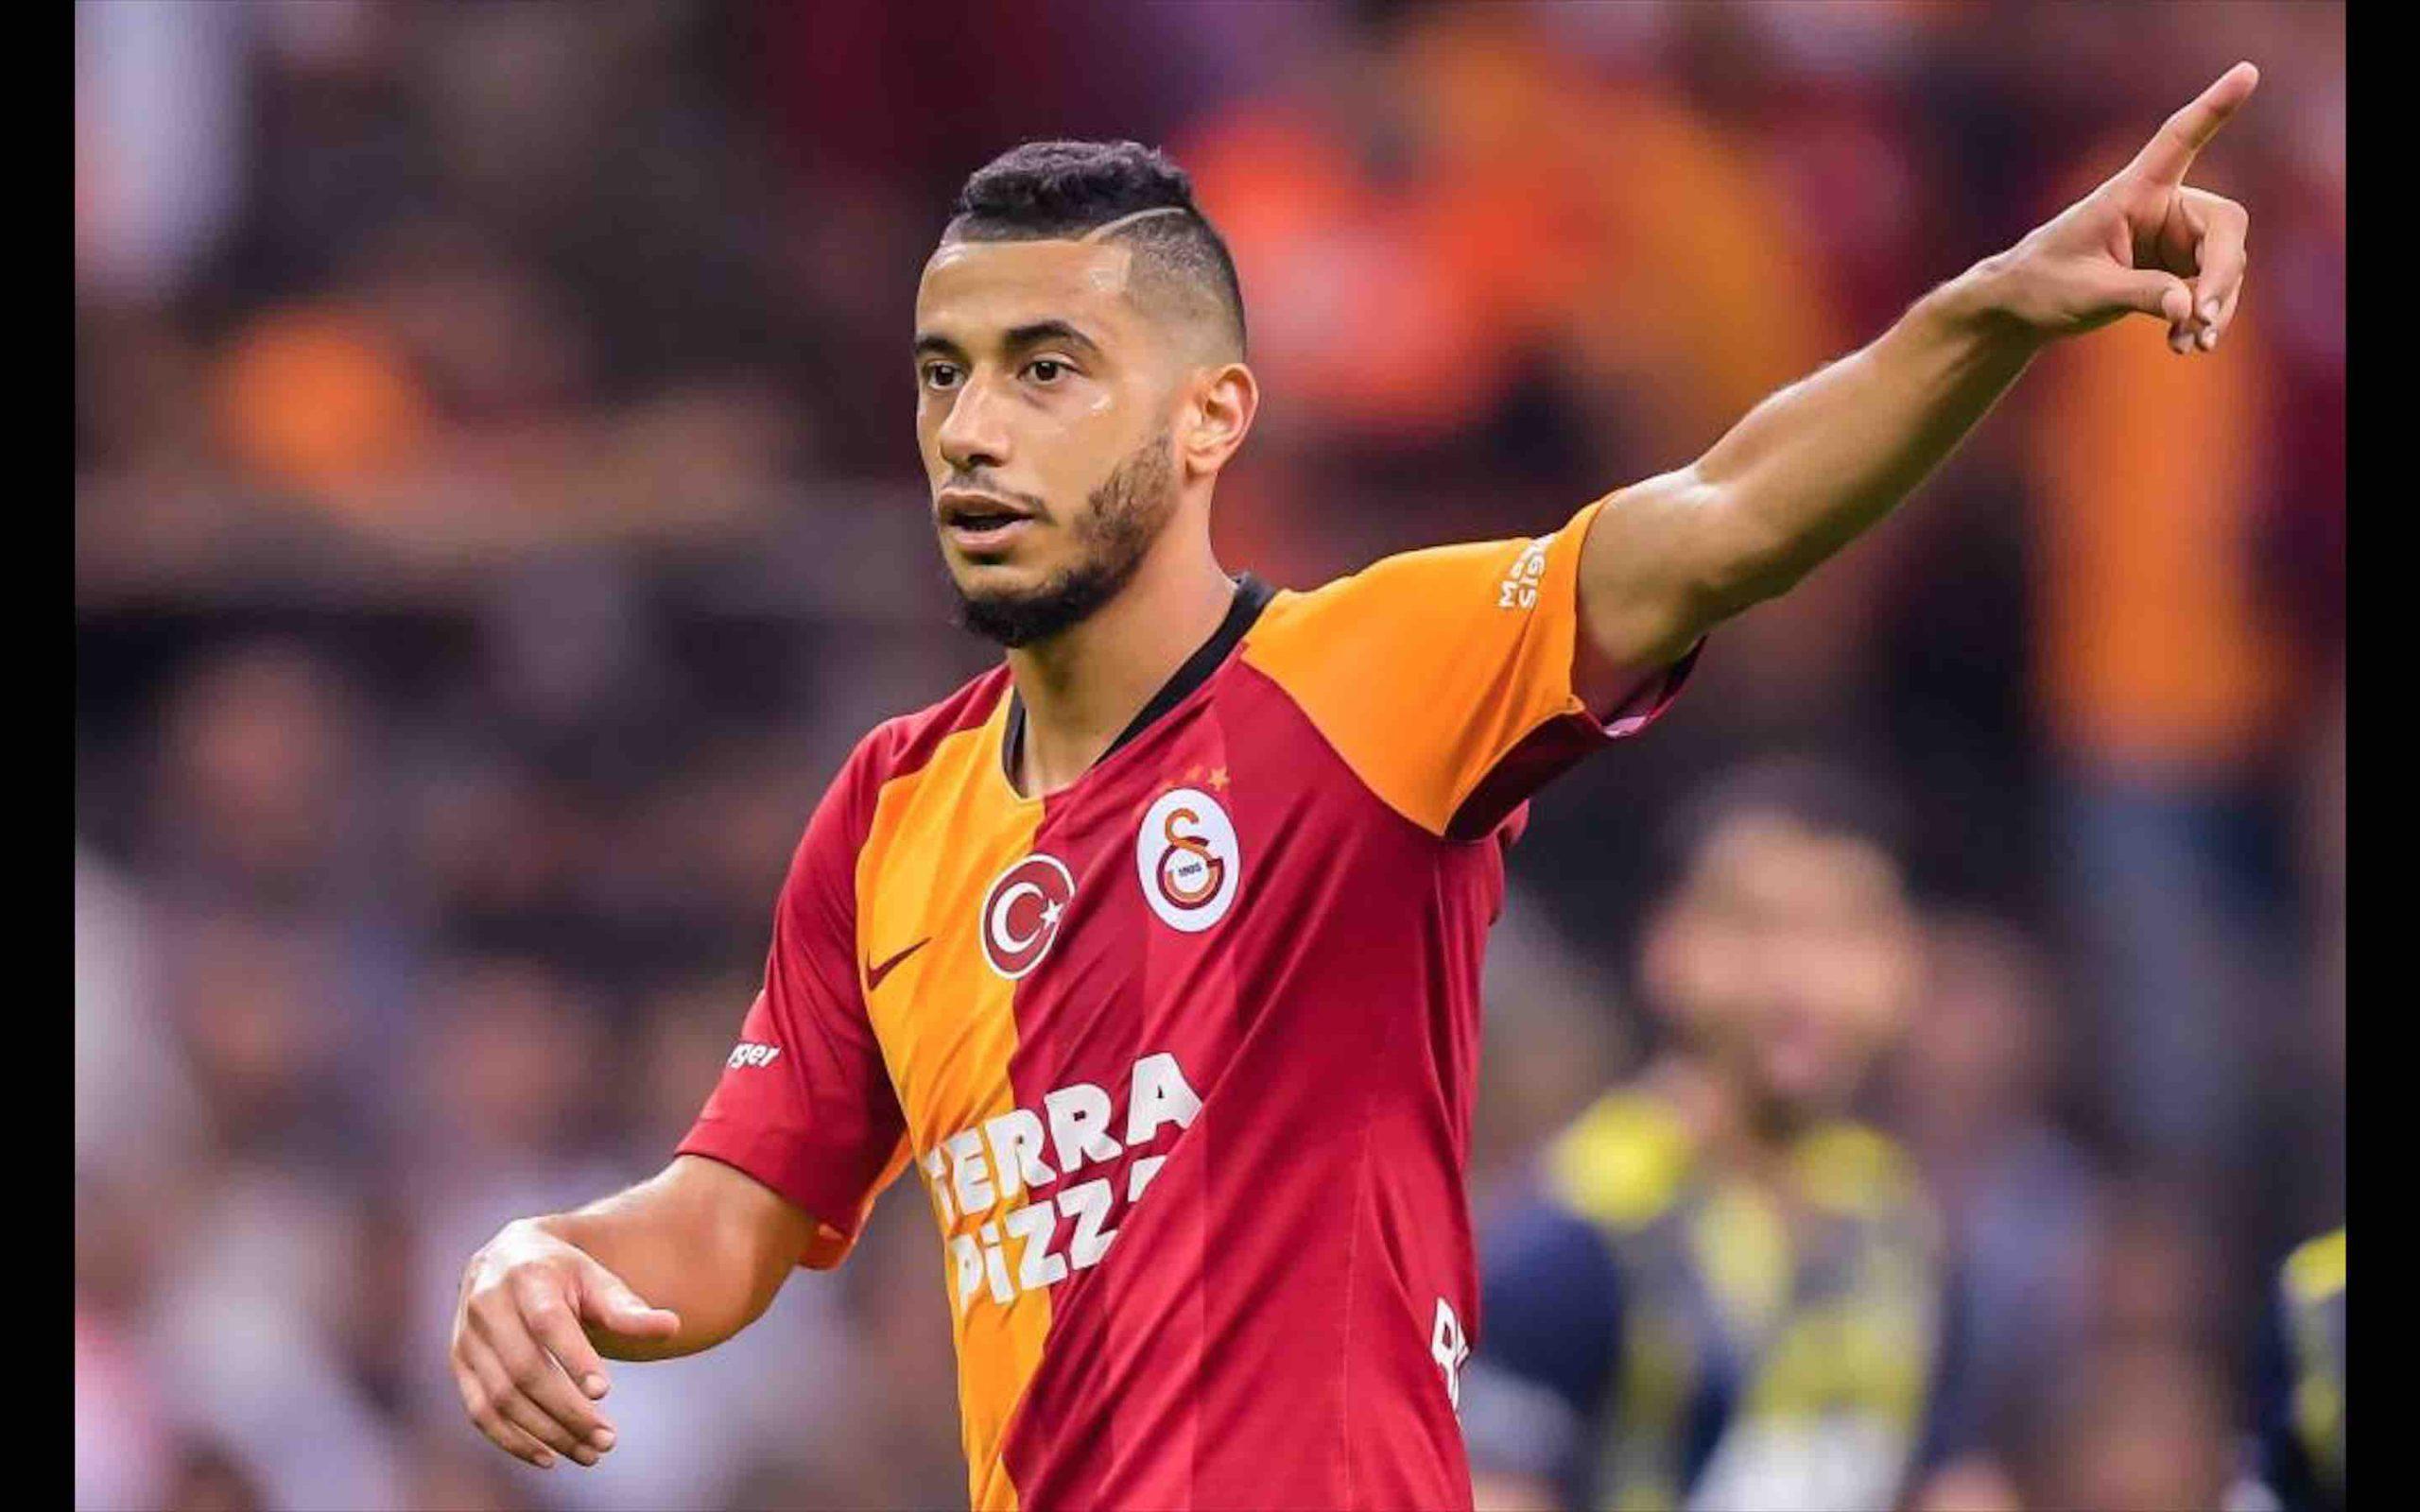 Footballeurs marocains de l'étranger : Belhanda possible retour en Ligue 1 !